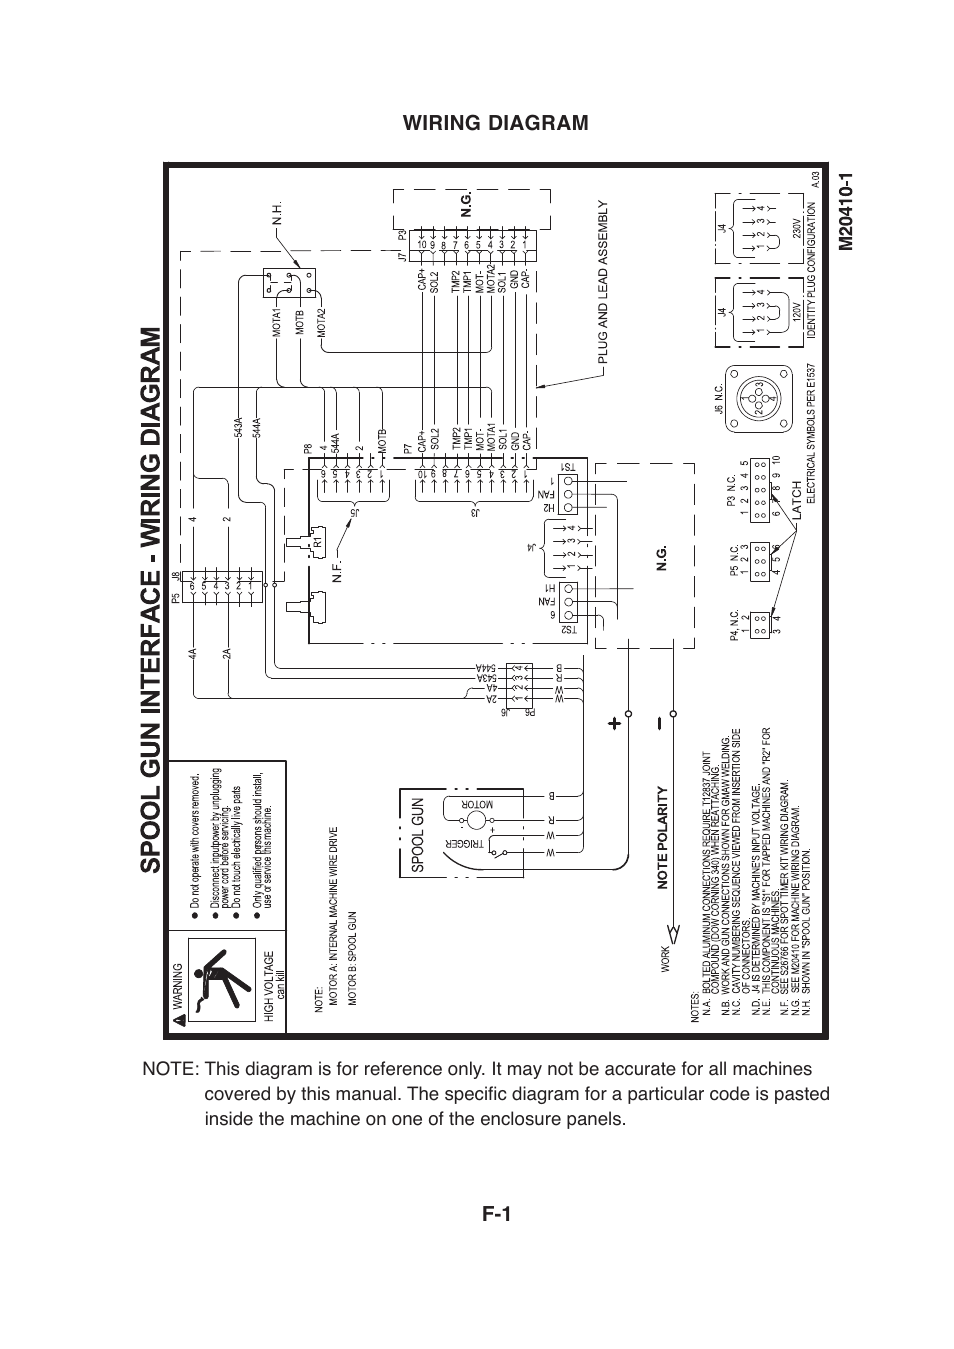 Lincoln Spool Gun Wiring Diagram - Wiring Diagram Article on